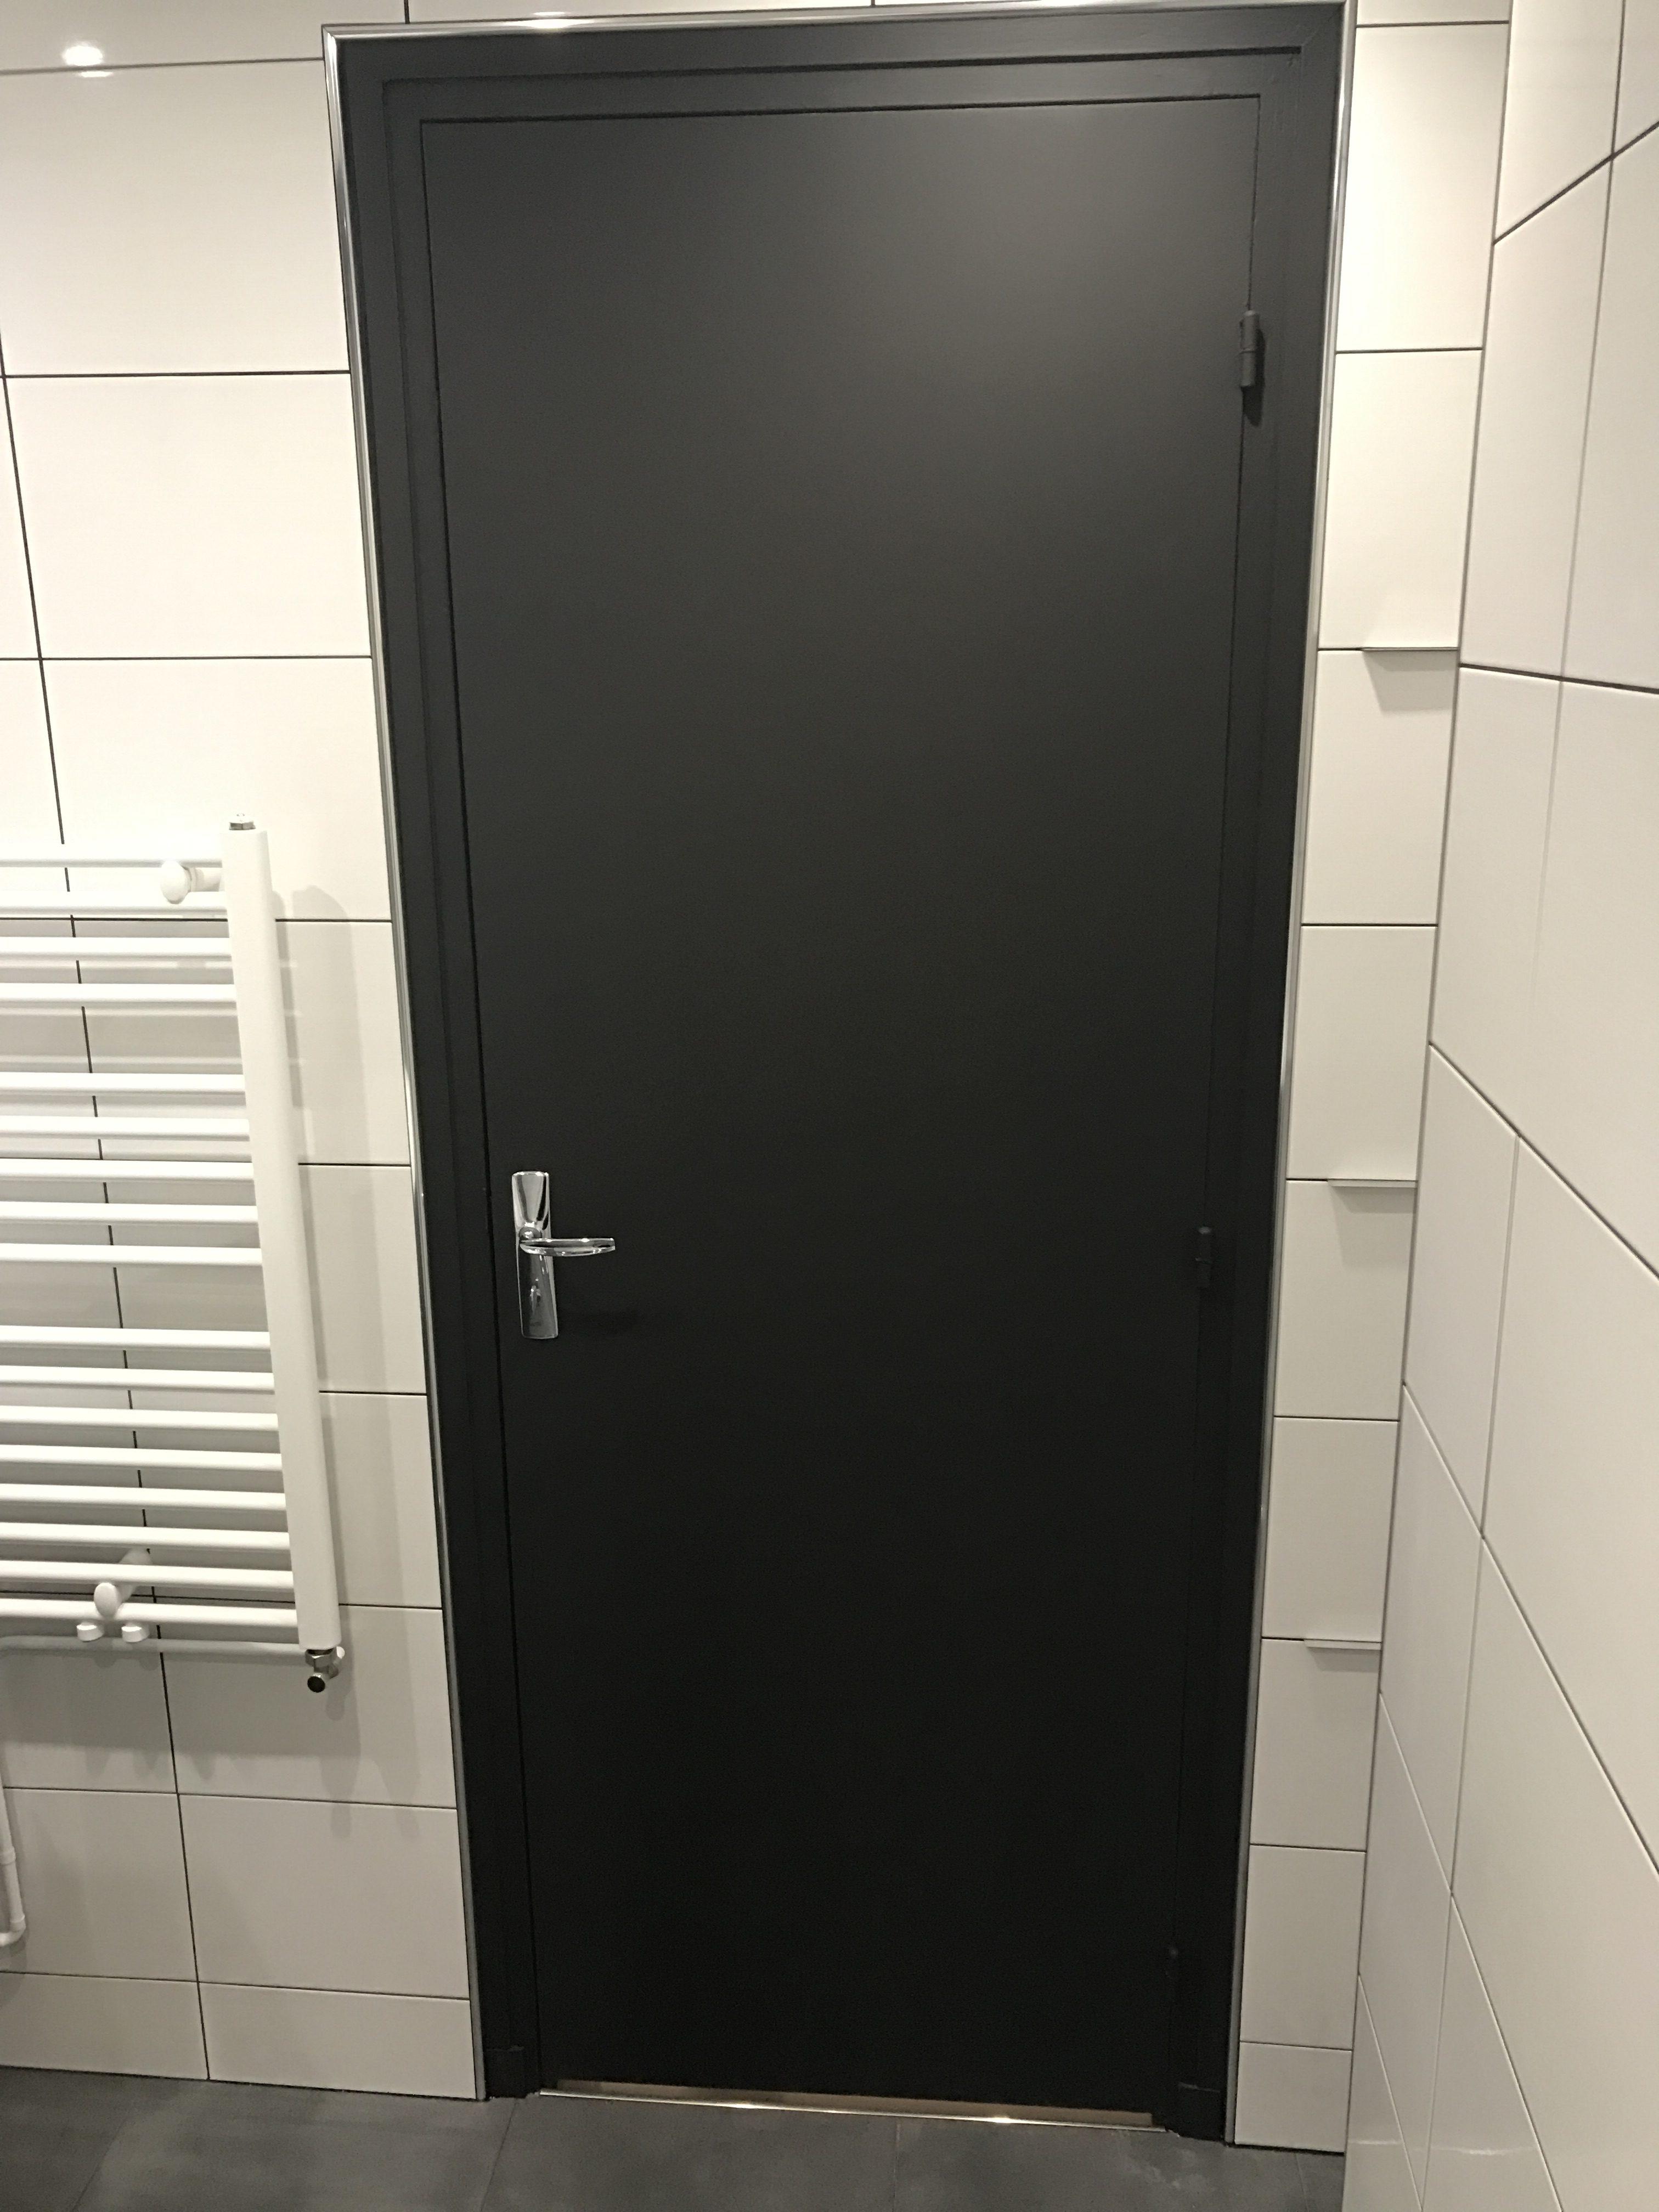 realisation-salle-de-bain-lcrdp-renovation-orleans-8